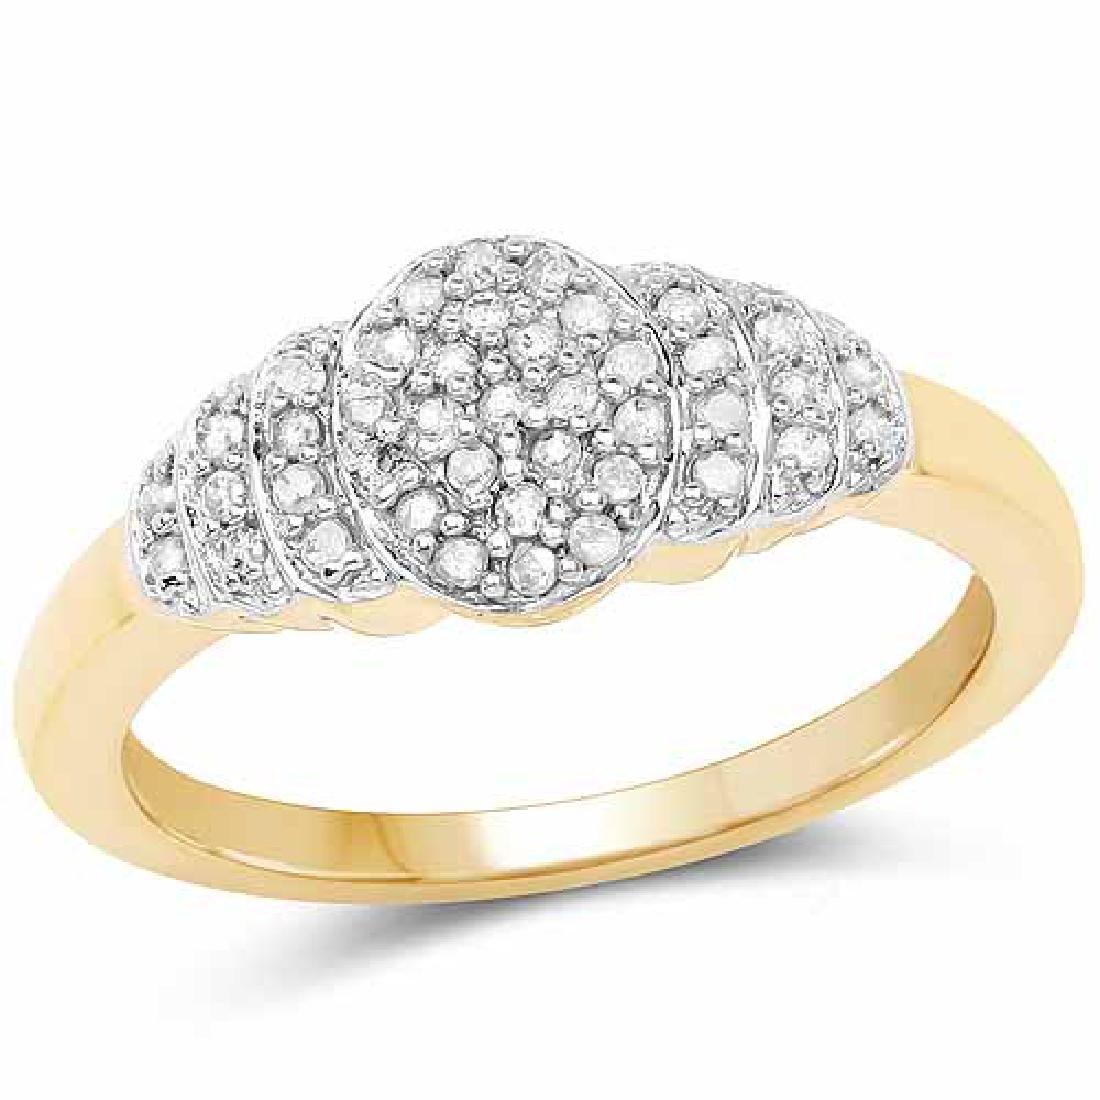 14K Yellow Gold Plated 0.22 Carat Genuine White Diamond